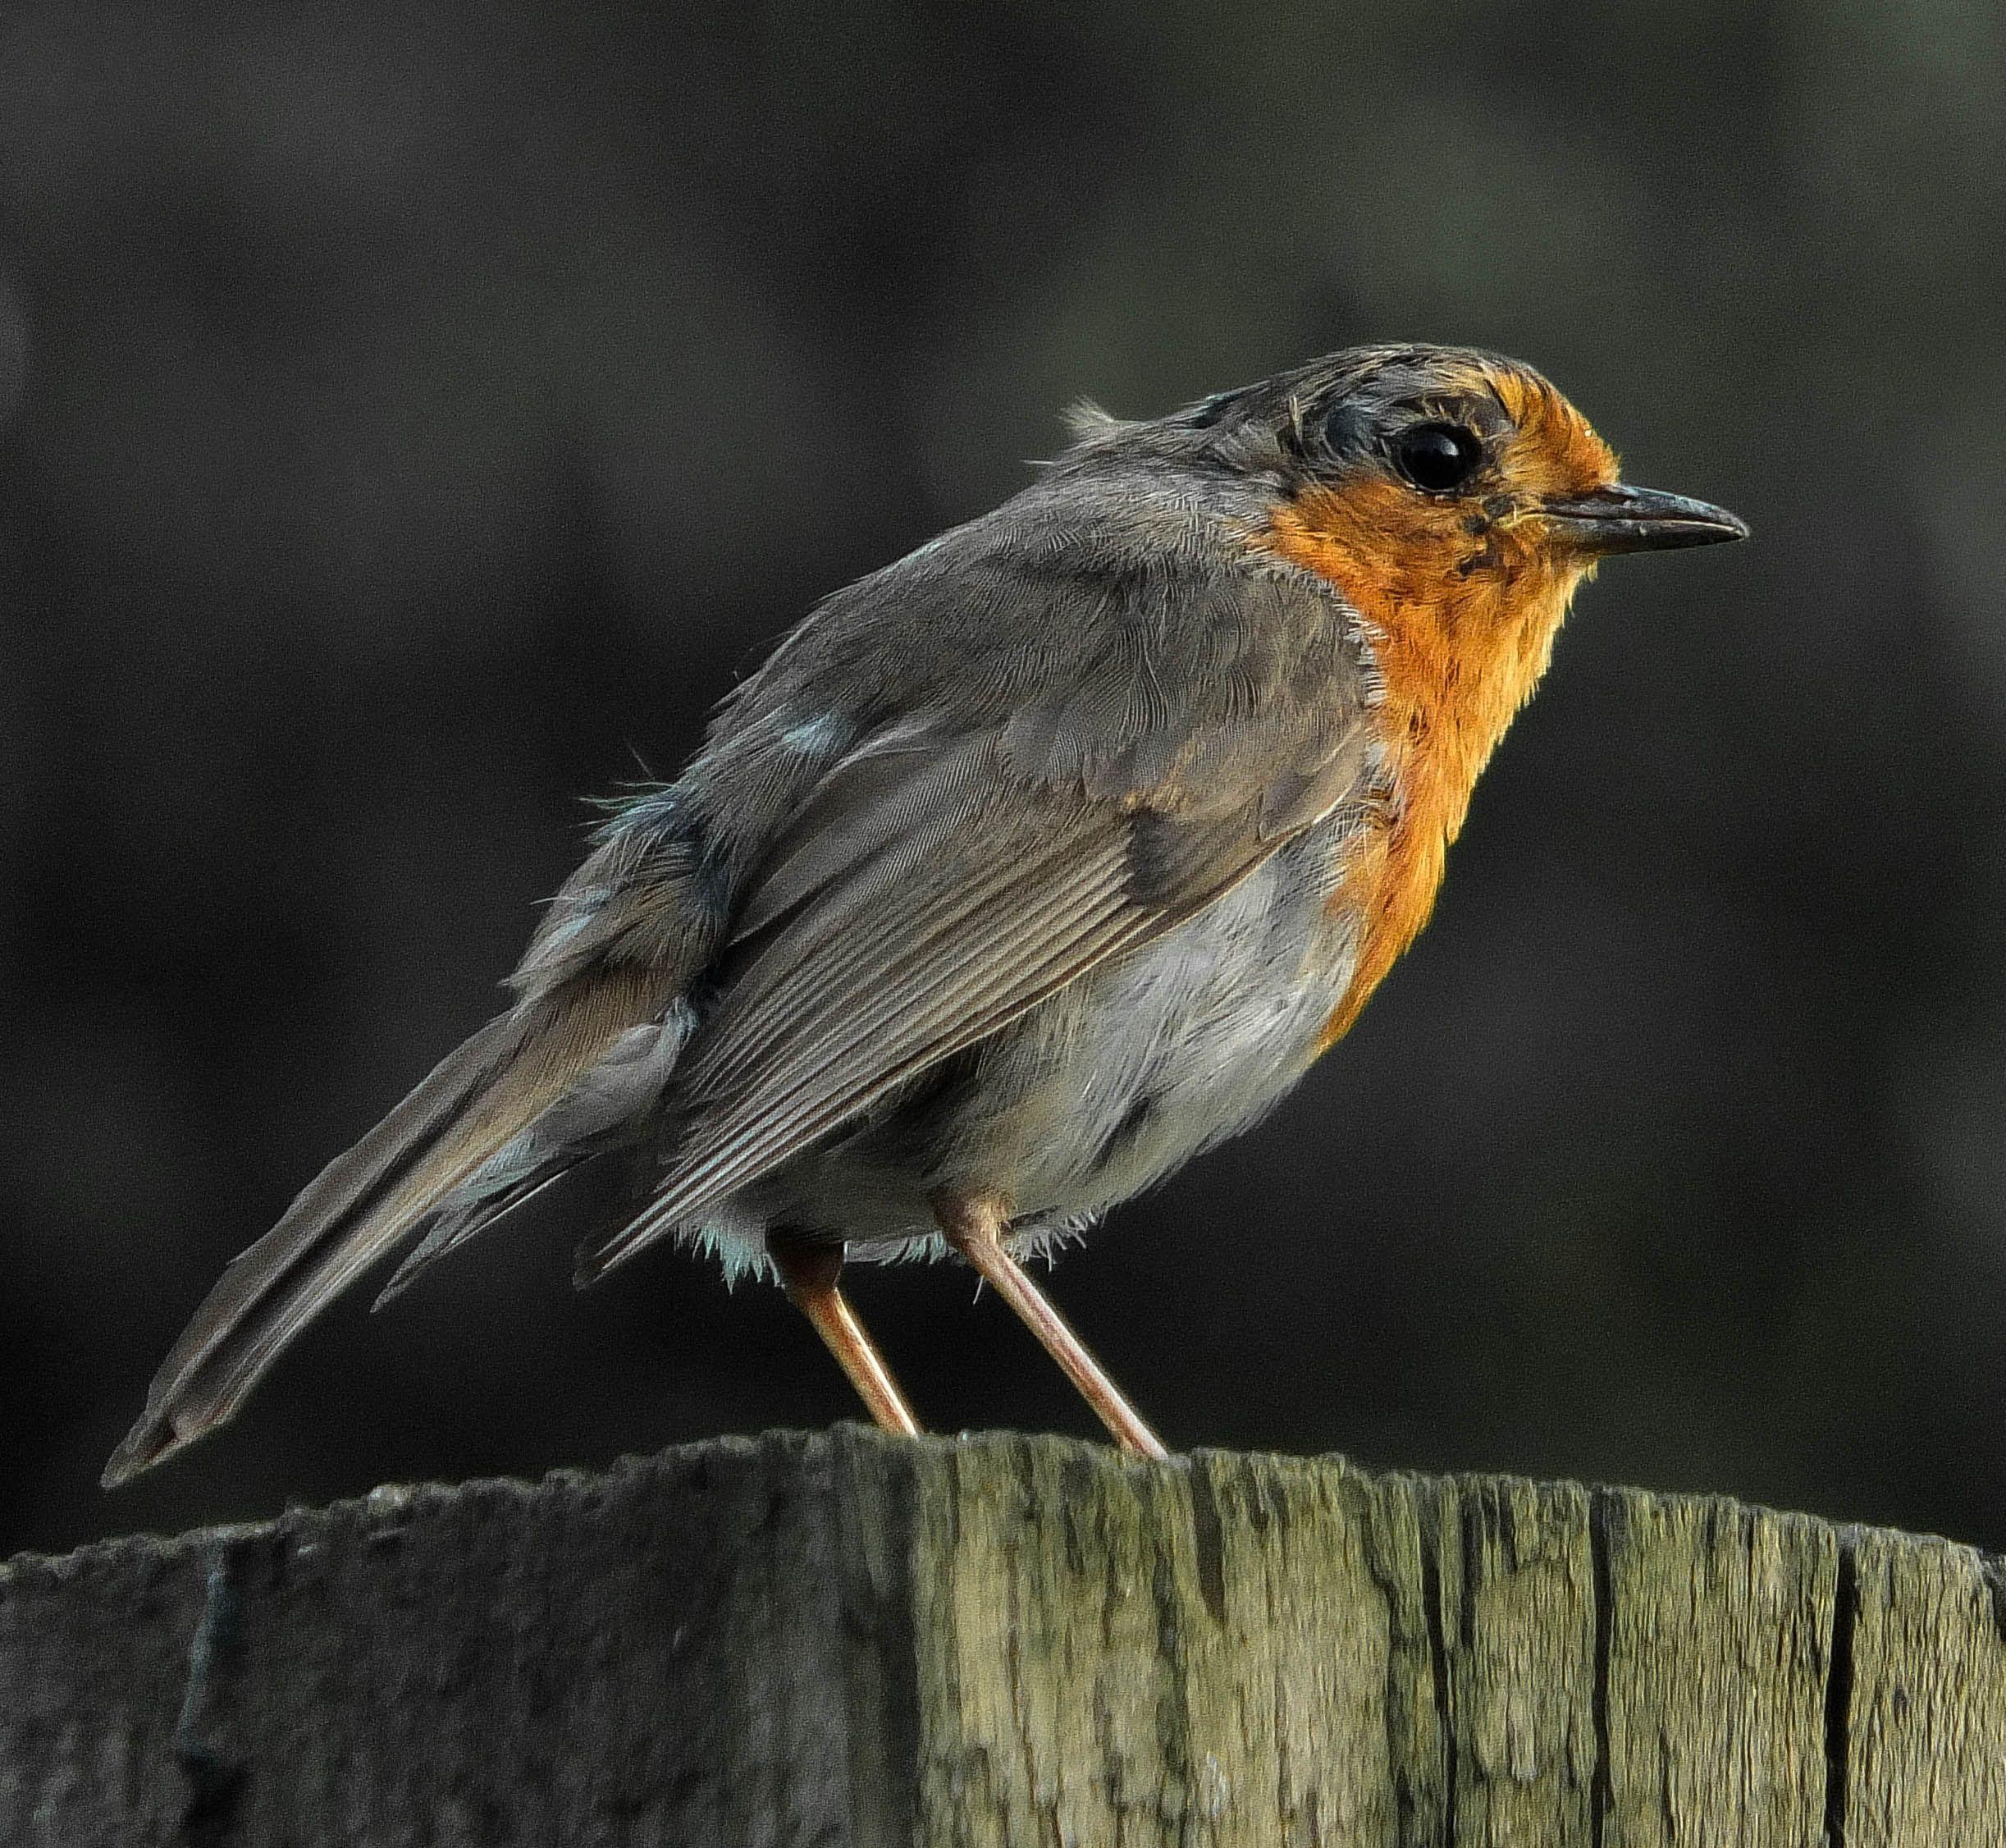 North Norfolk Nature on #FujifilmXWorld